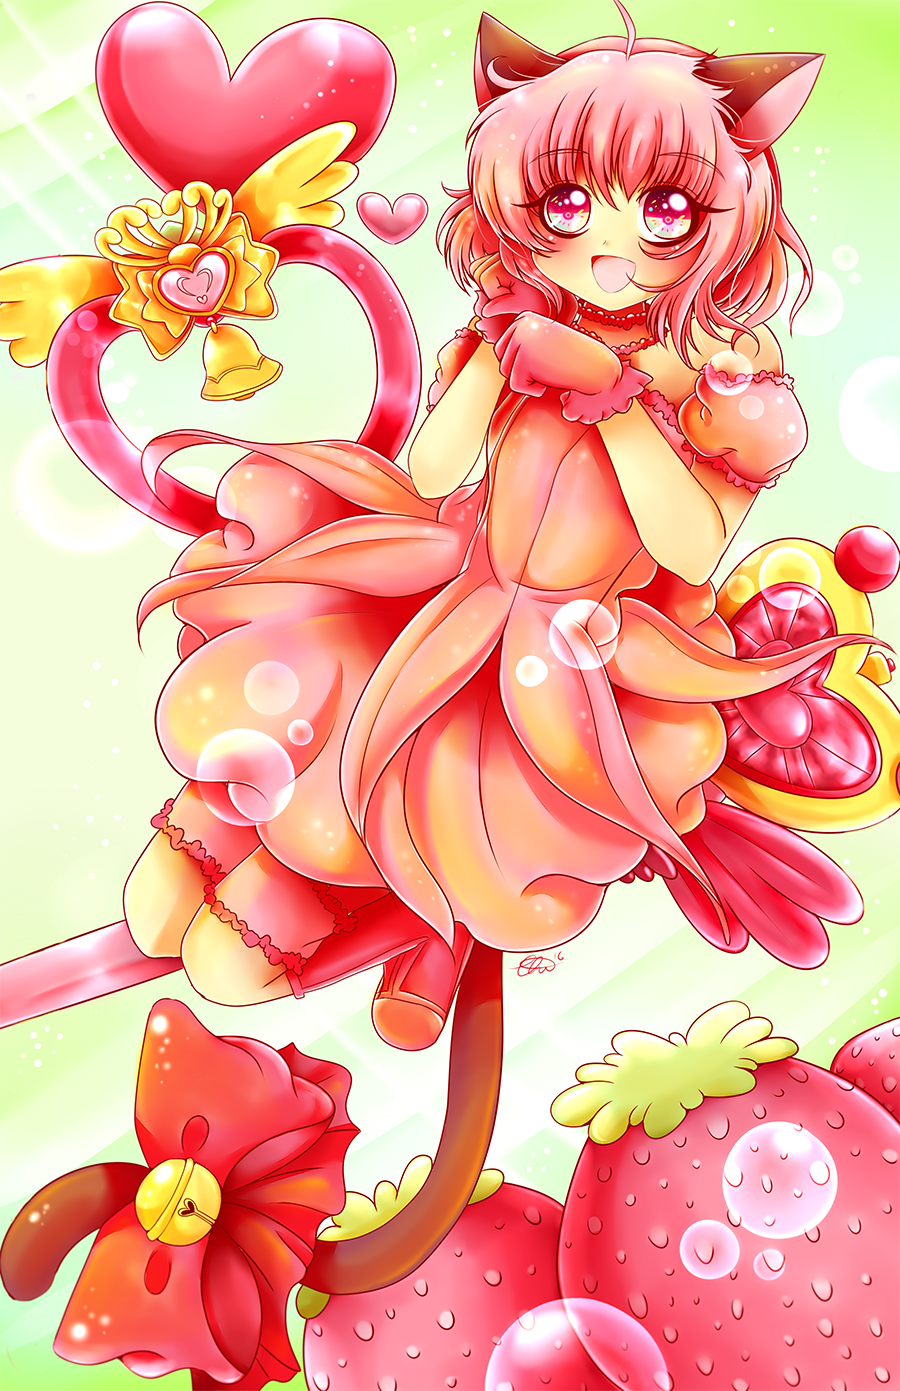 strawberry_heart_by_seirasenchii-da5omef.png